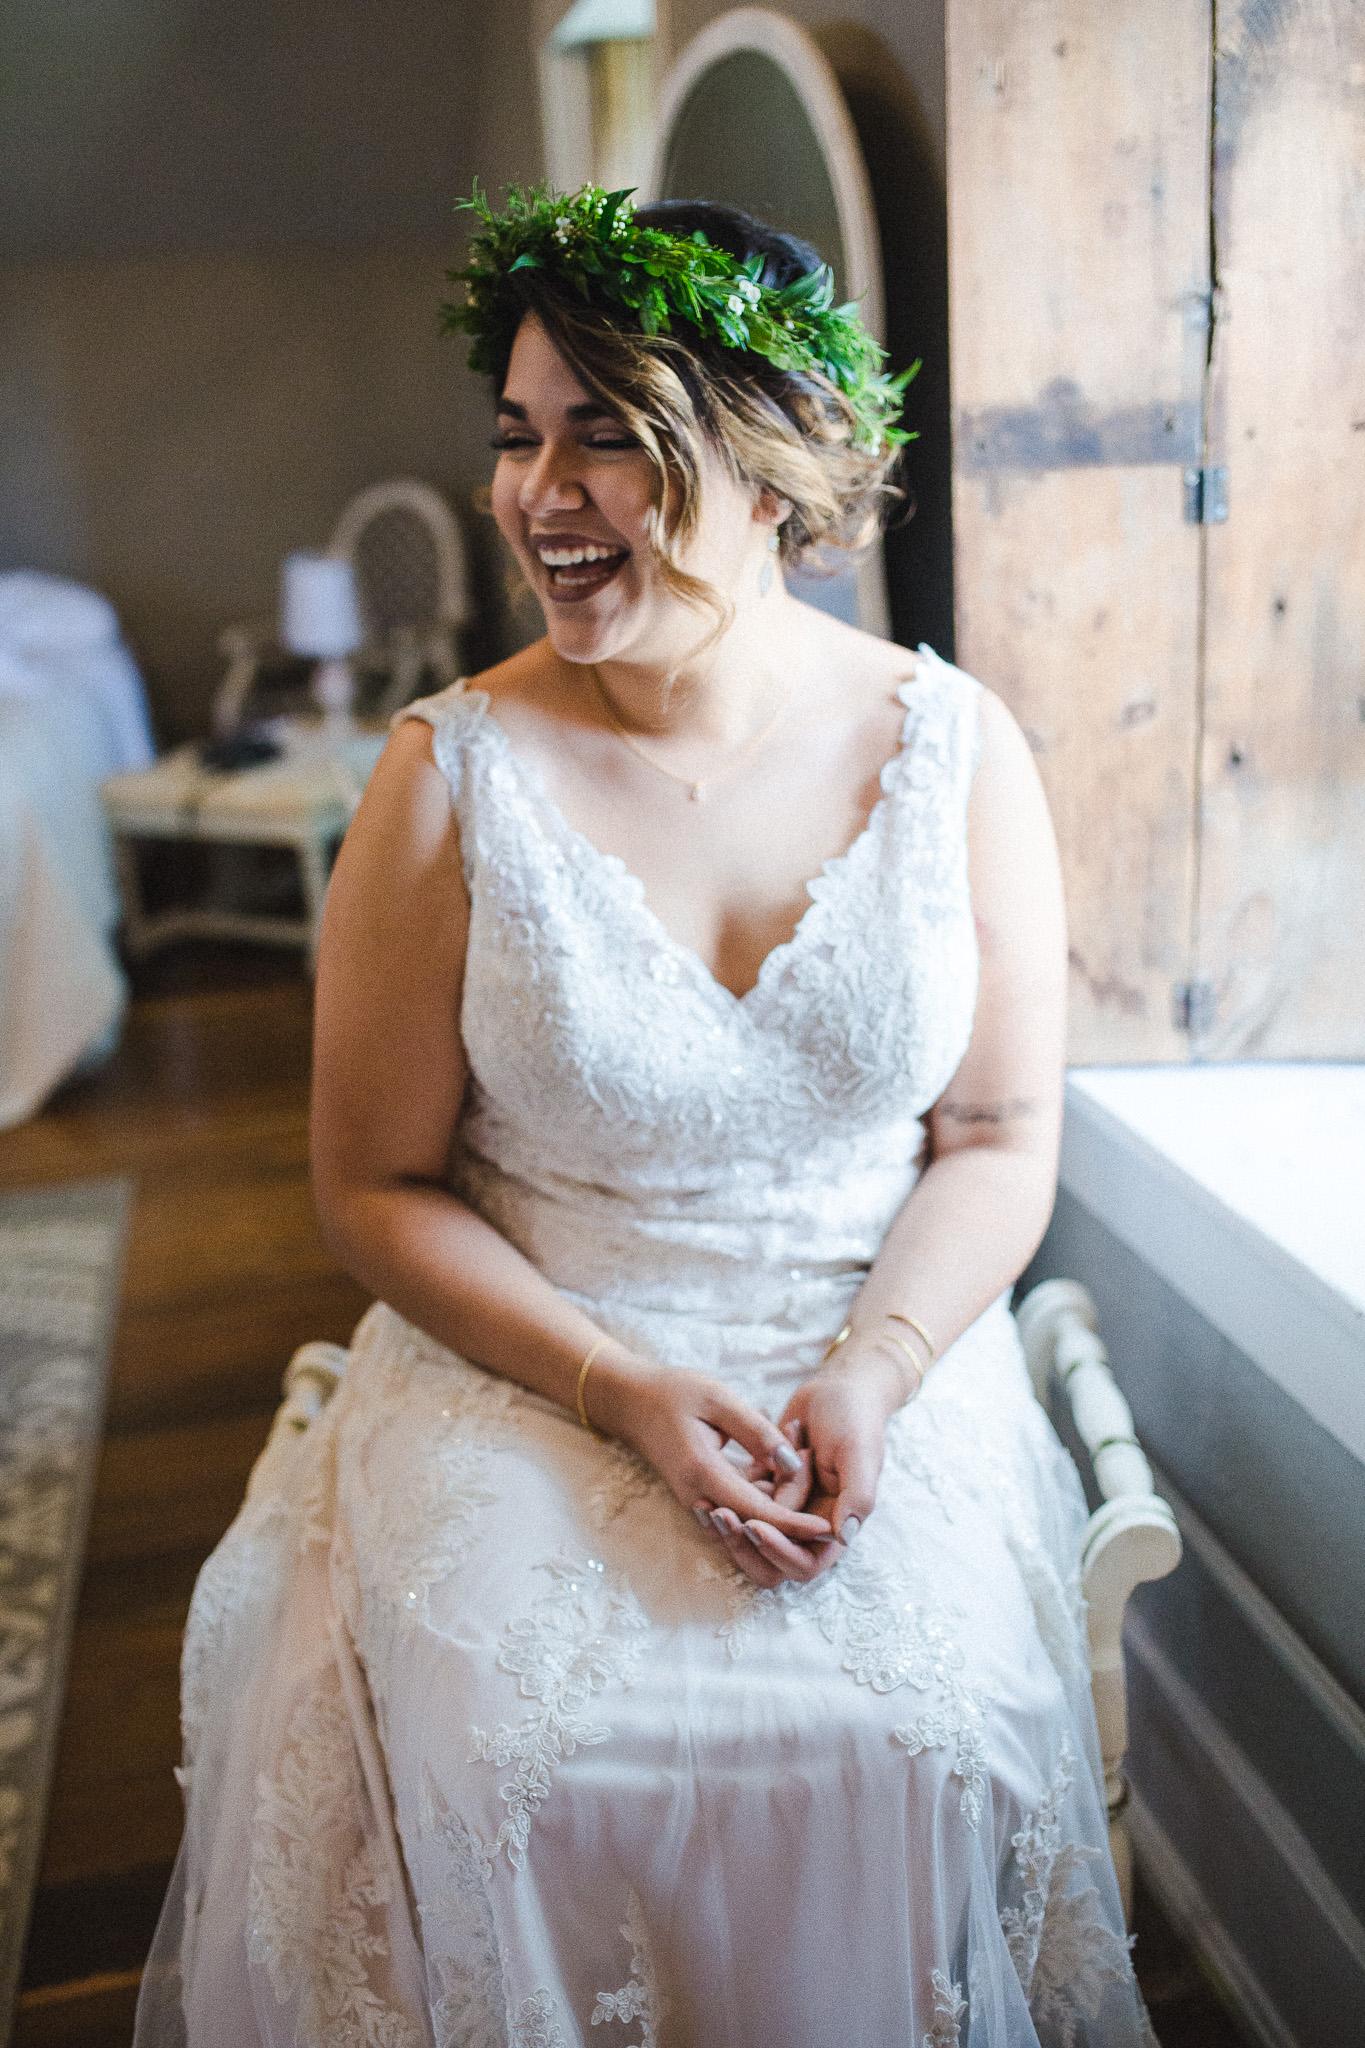 Orlando-Wedding-Photographer (42 of 46).JPG